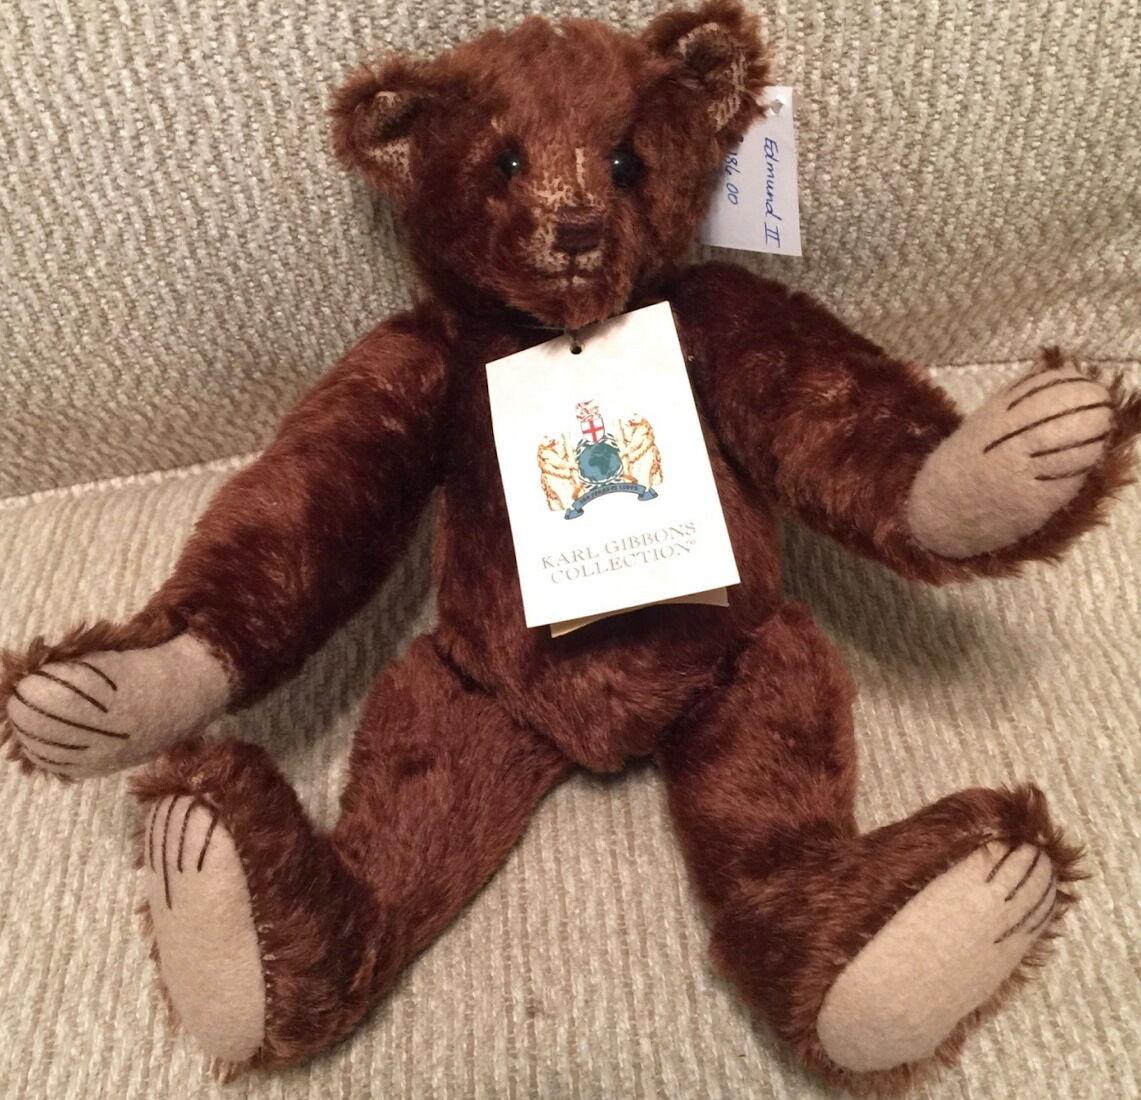 KARL GIBBONS Collection 1999  EDMUND II  Mohair Teddy Bear  20/500 w/Tag England